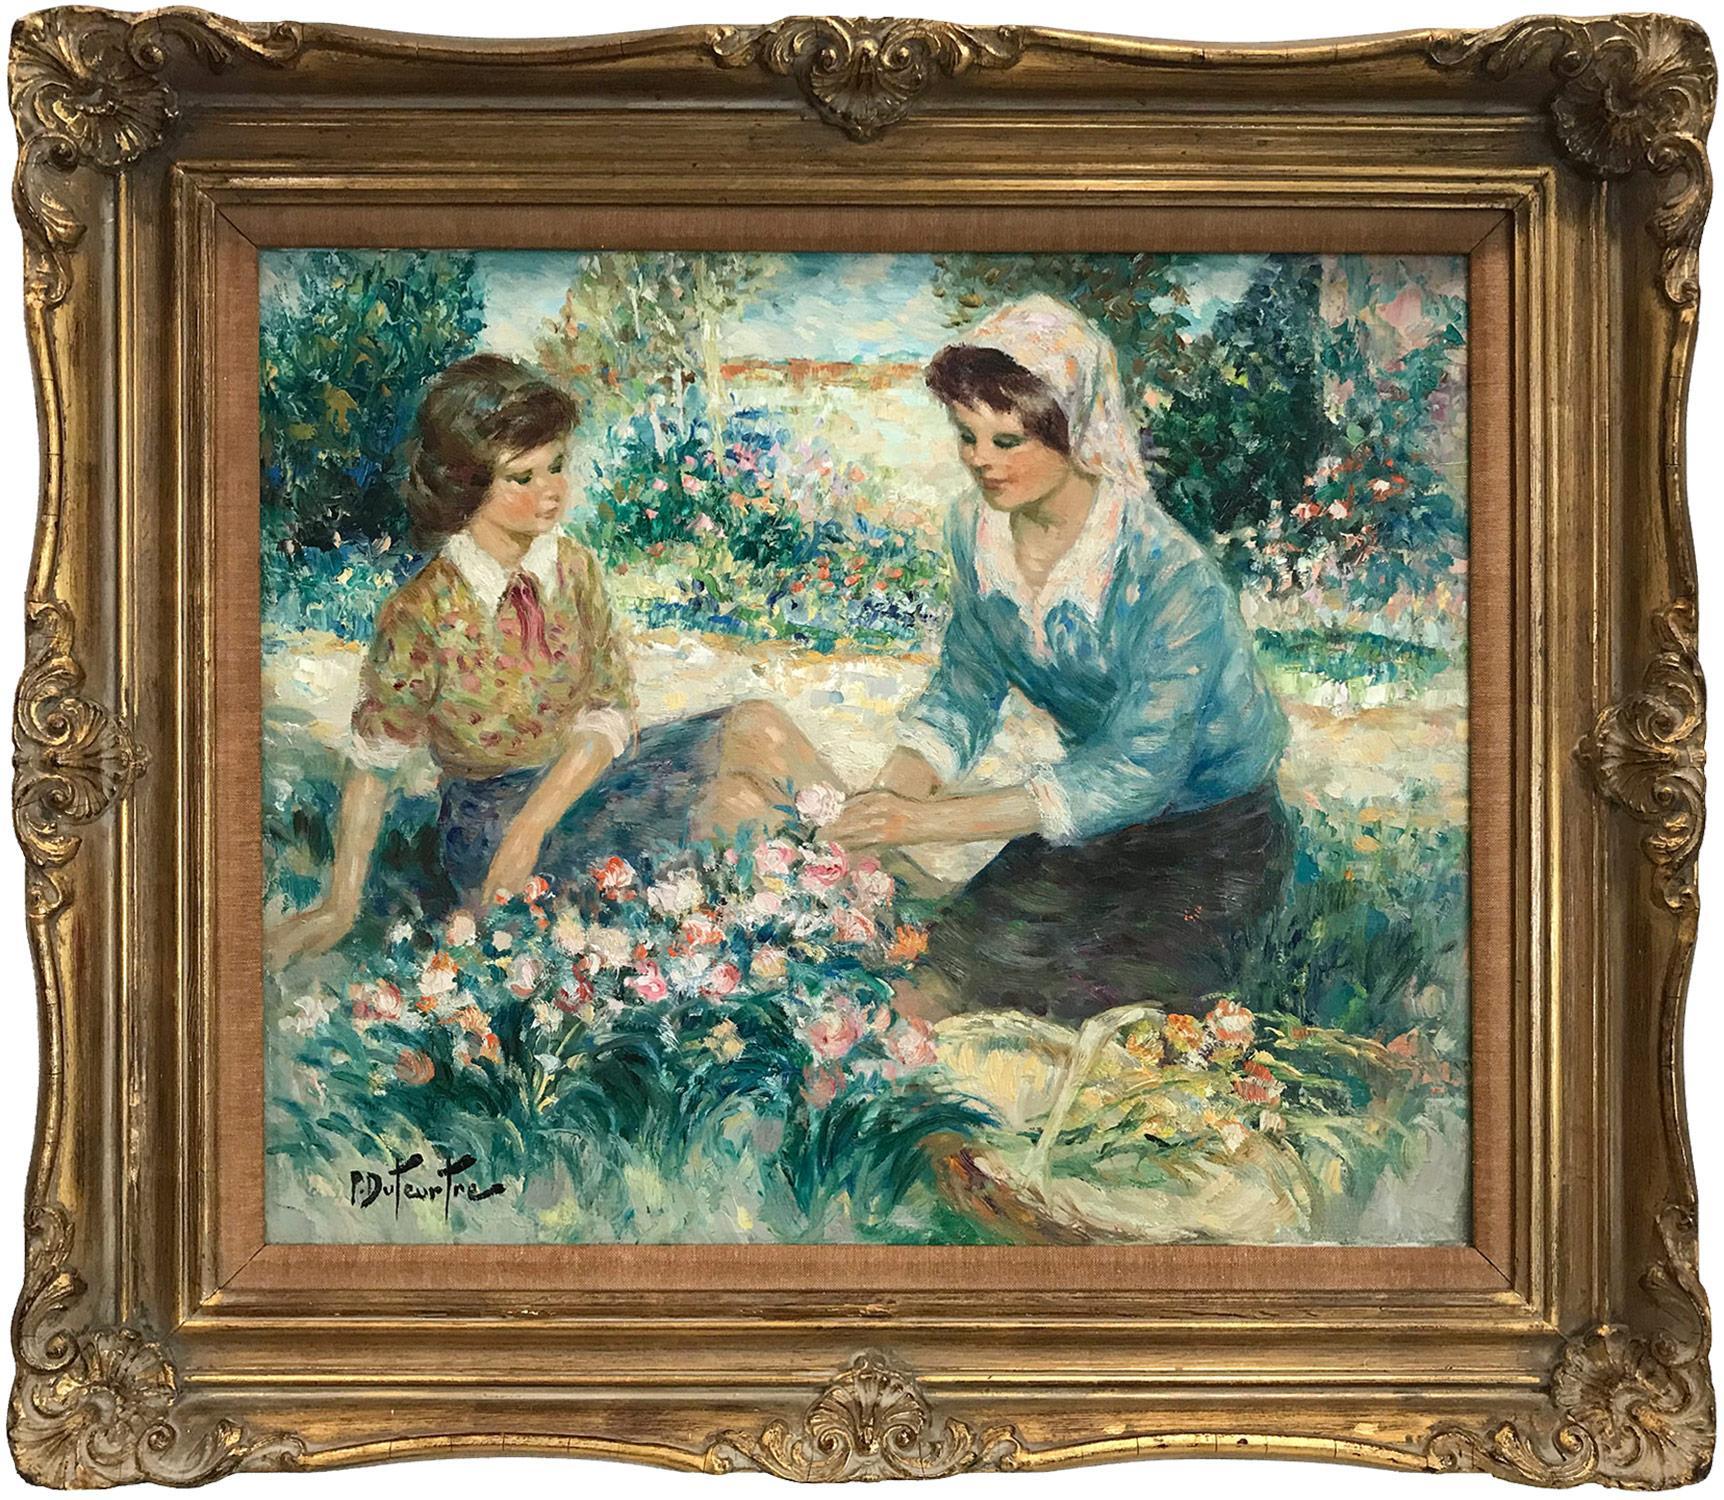 """Au Jardin"" 20th Century French Oil Painting Figures in a Garden Landscape Scene"